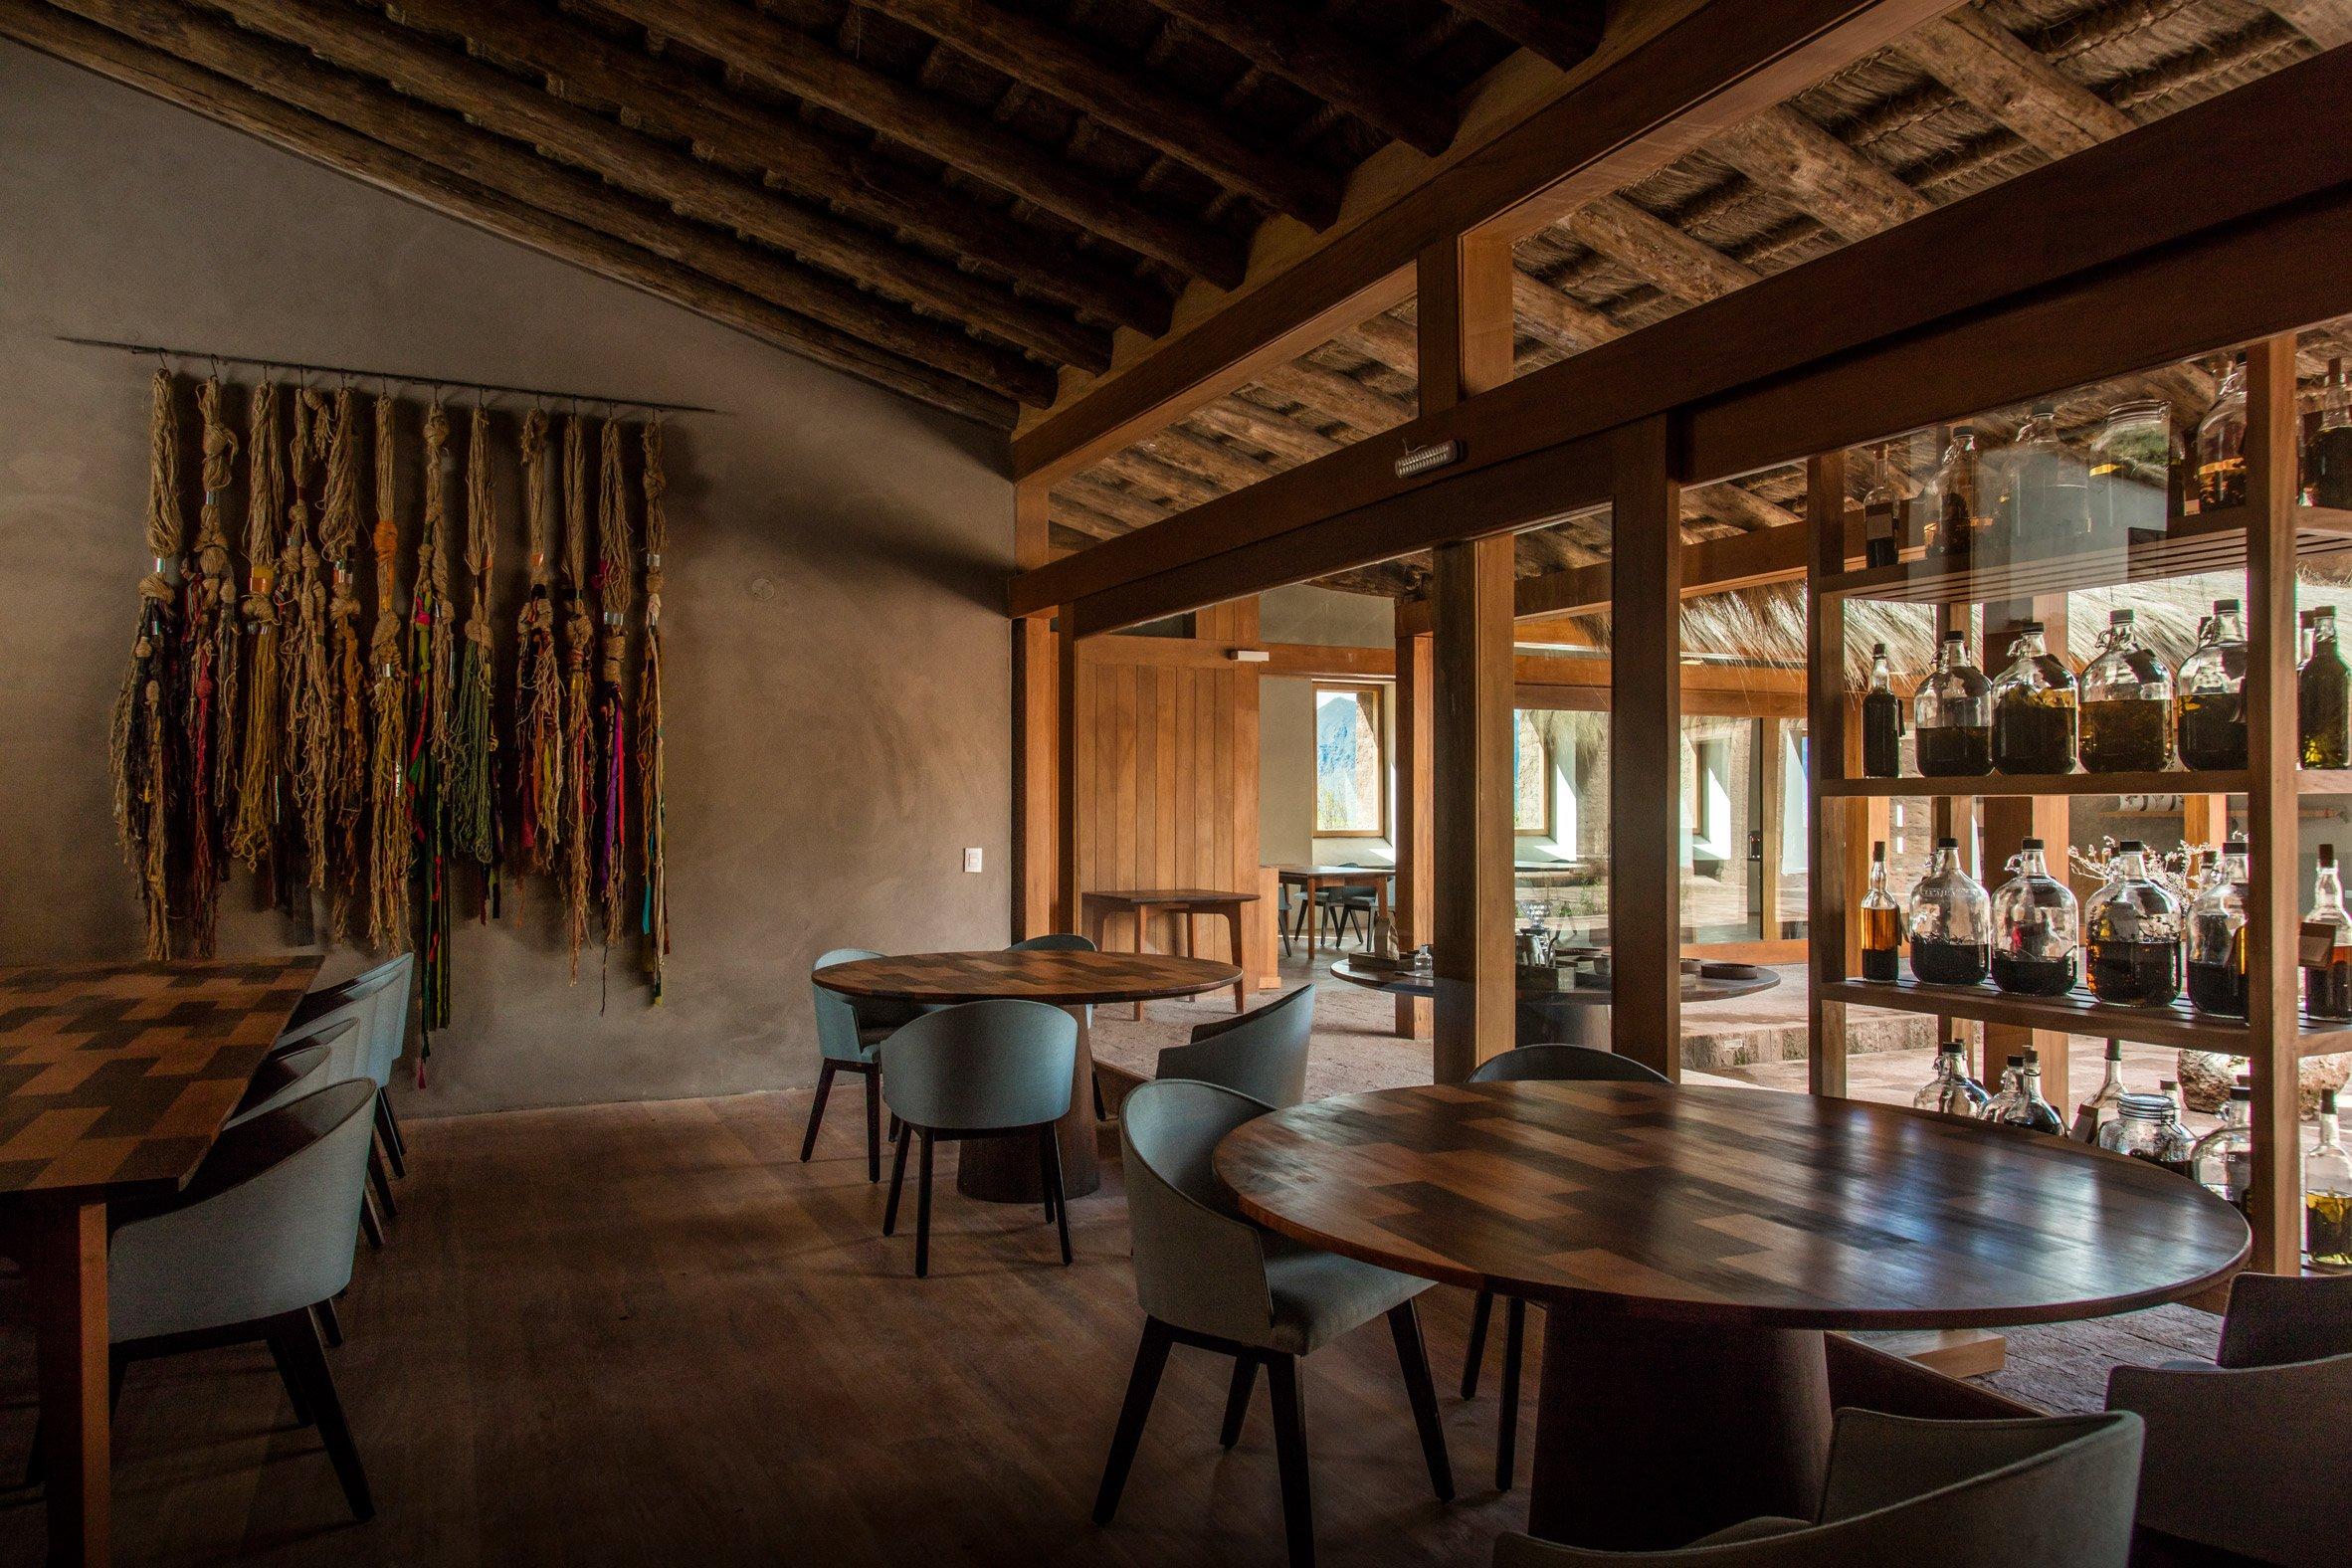 Mil Centro restaurant by Estudio Rafael Freyre